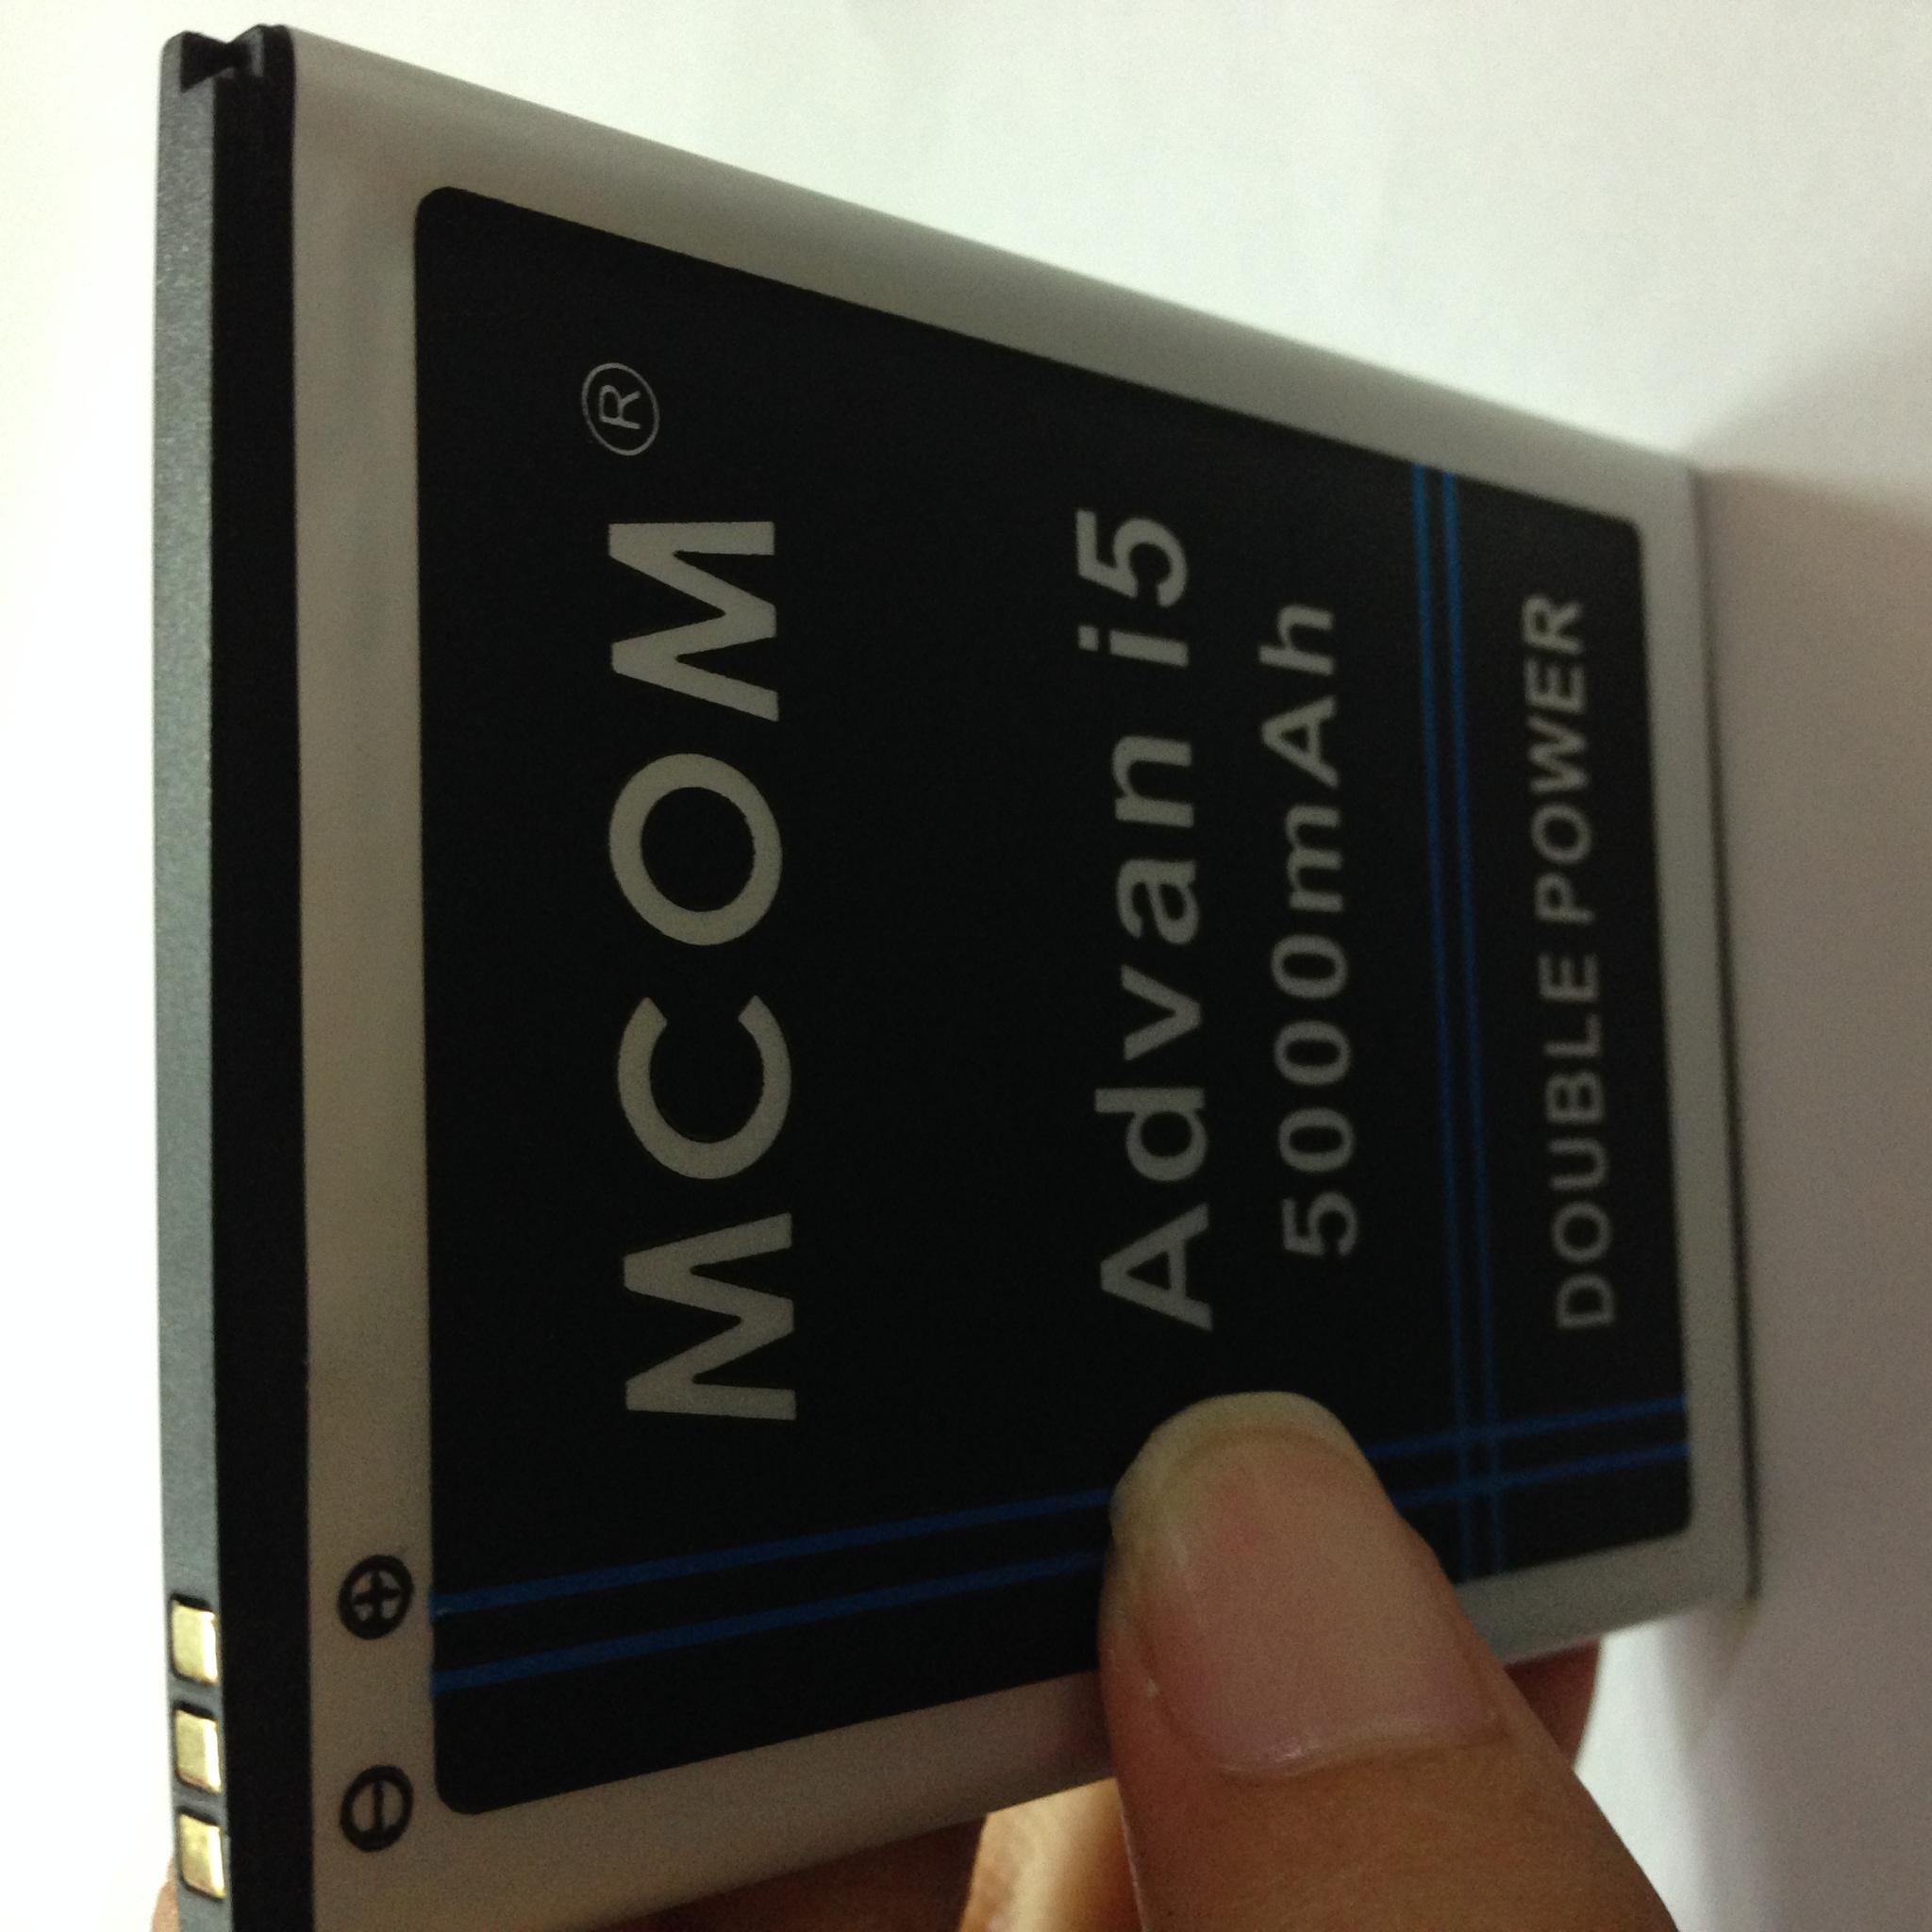 Battery 4000 Source Baterai Advan Vandroid I5 4g Lte Double Power Mcom